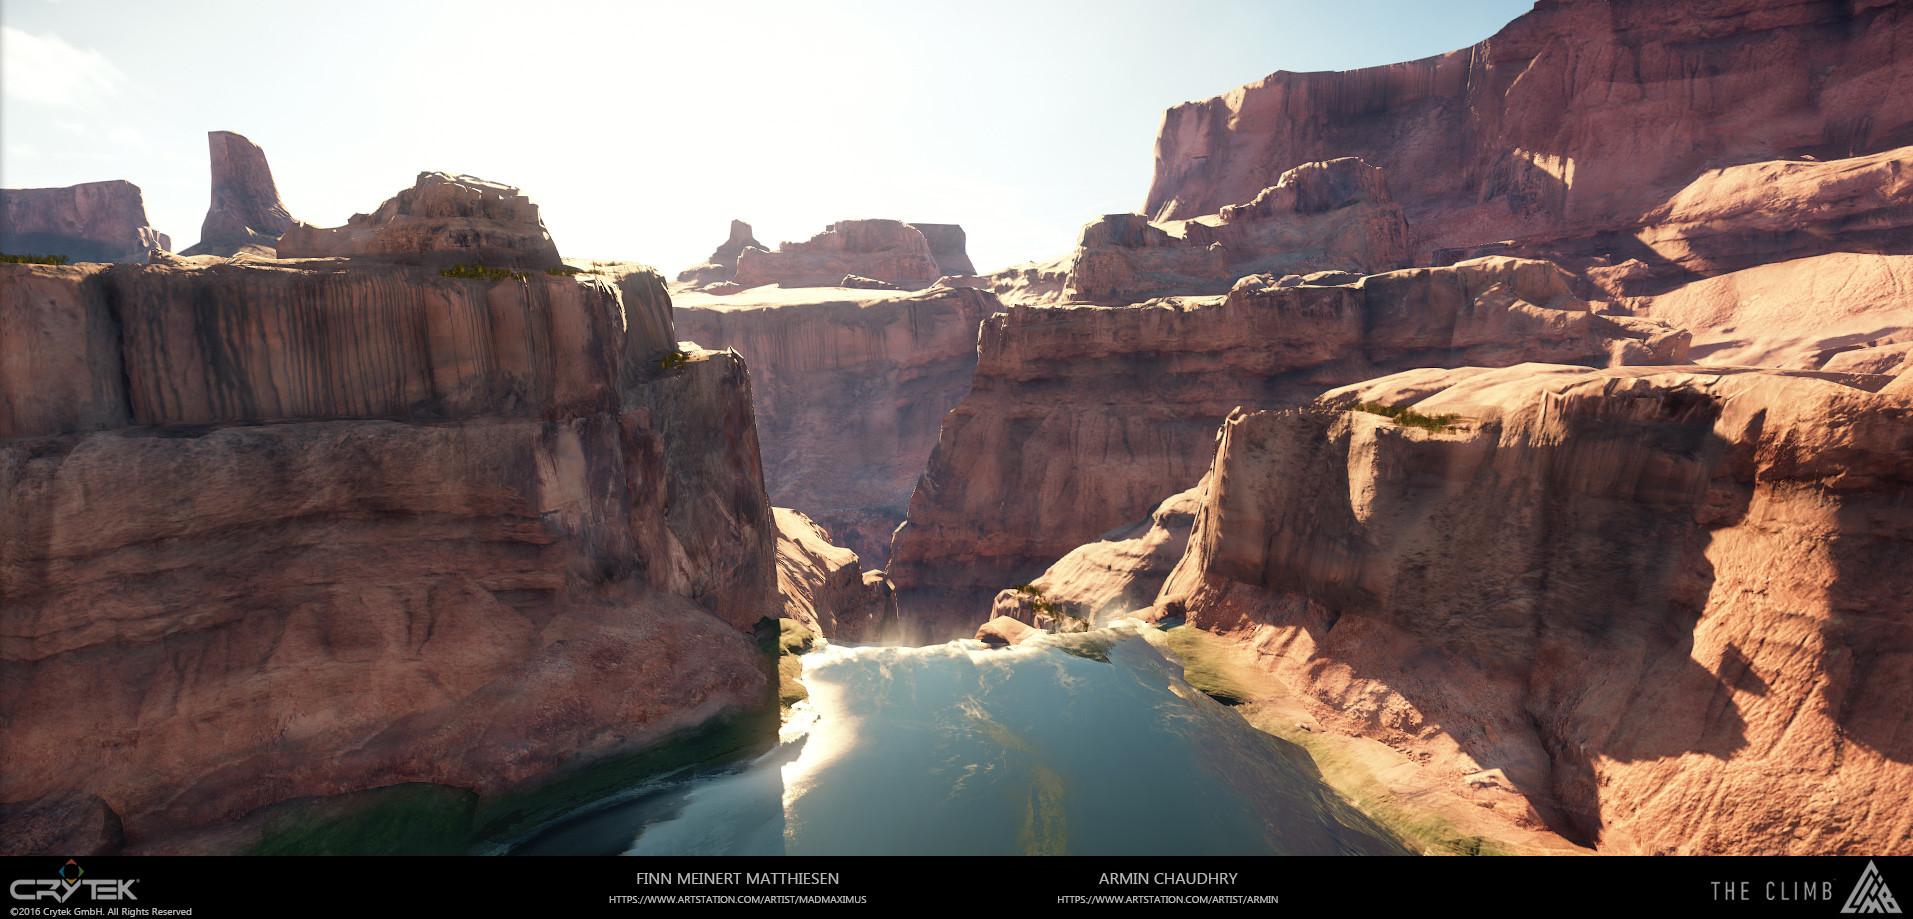 ArtStation - The Climb - USA Midday - Vista, Armin Chaudhry